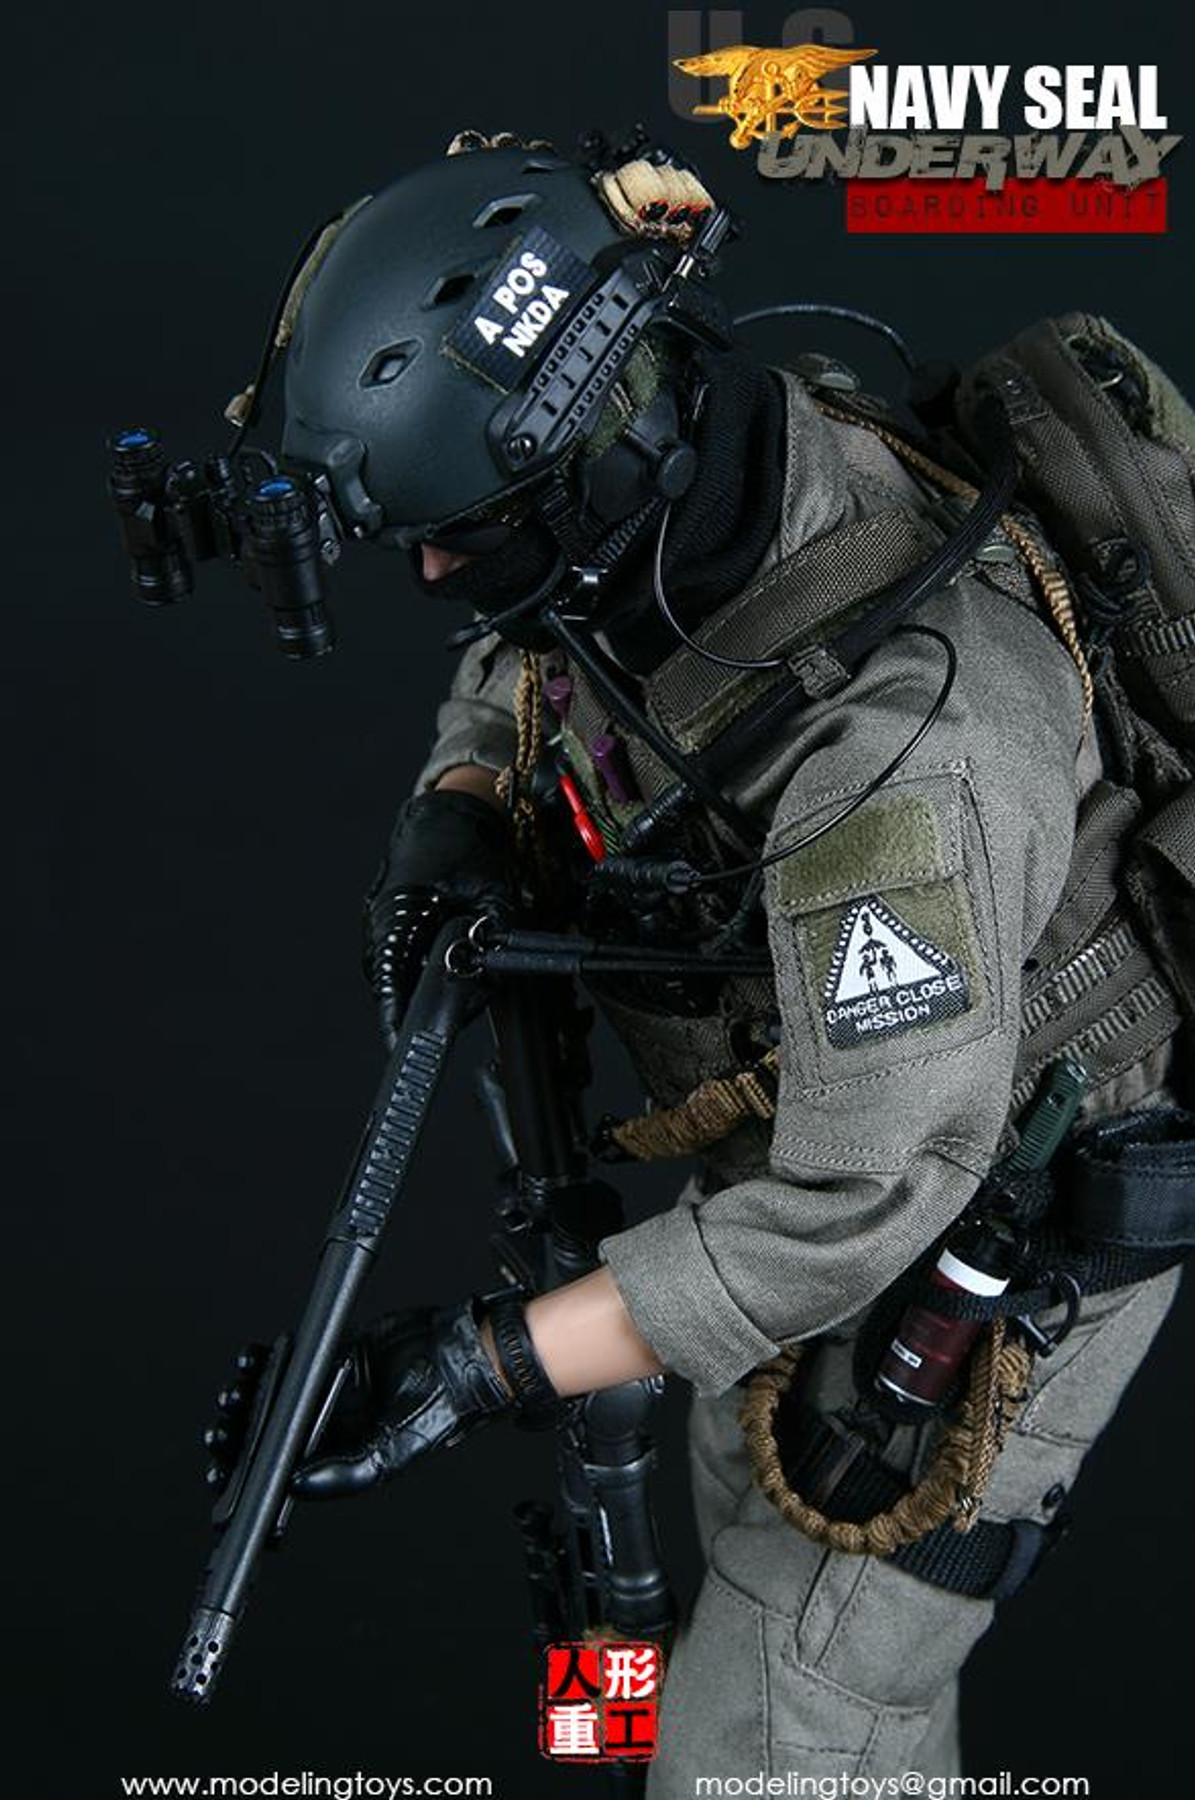 Modeling Action Figures Navy SEAL Boarding Unit MK24 Pistol Set 1//6 Scale